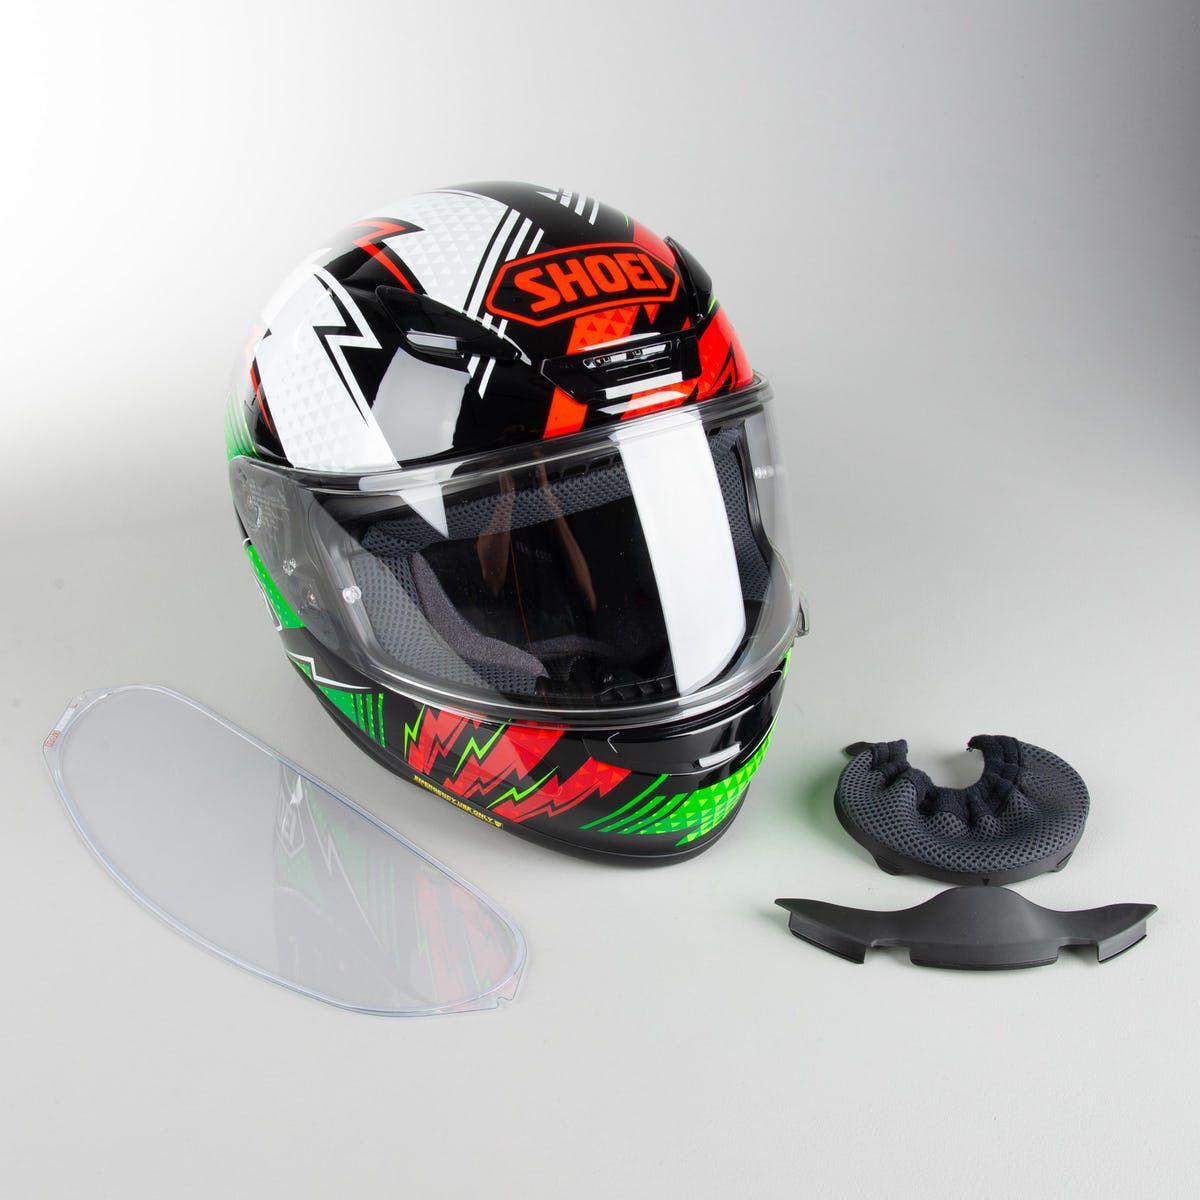 CAPACETE SHOEI NXR VARIABLE TC-4 BRILHANTE - NOVO!  - Motosports